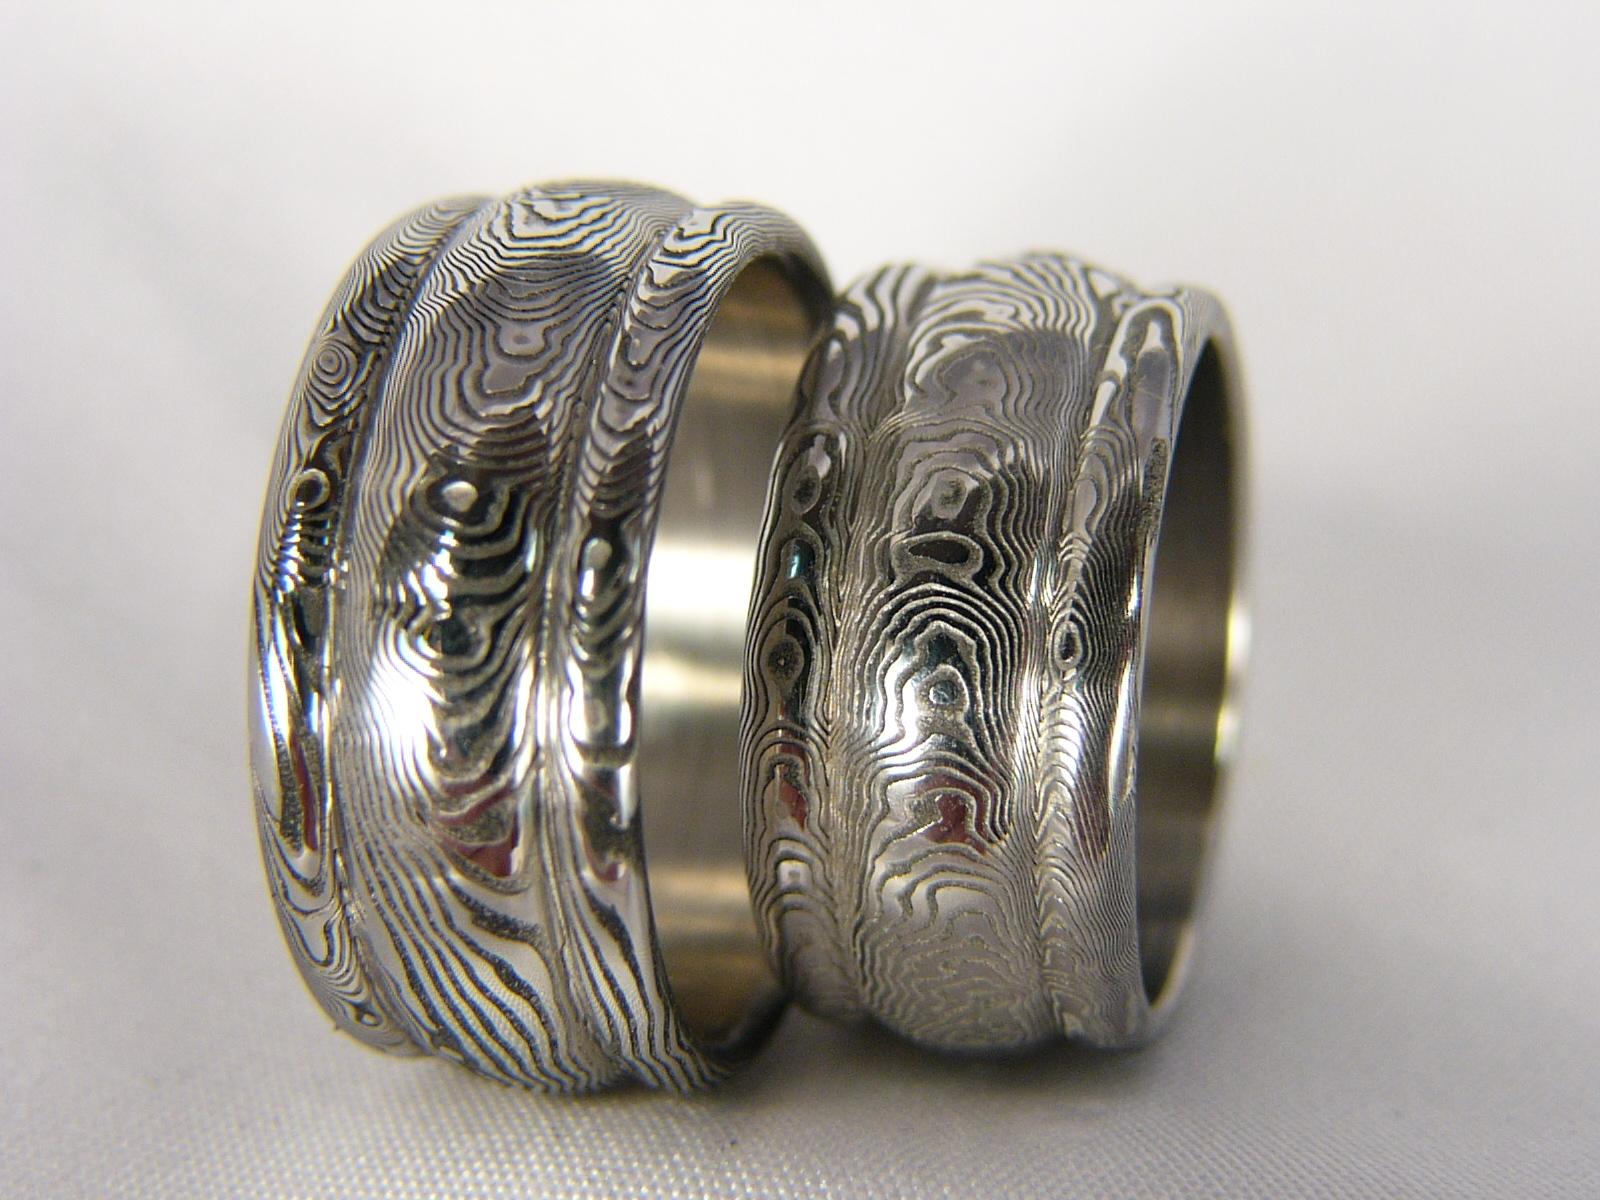 Snubni Prsteny Denethor Z Damascenske Oceli Zbozi Prodejce Cubick